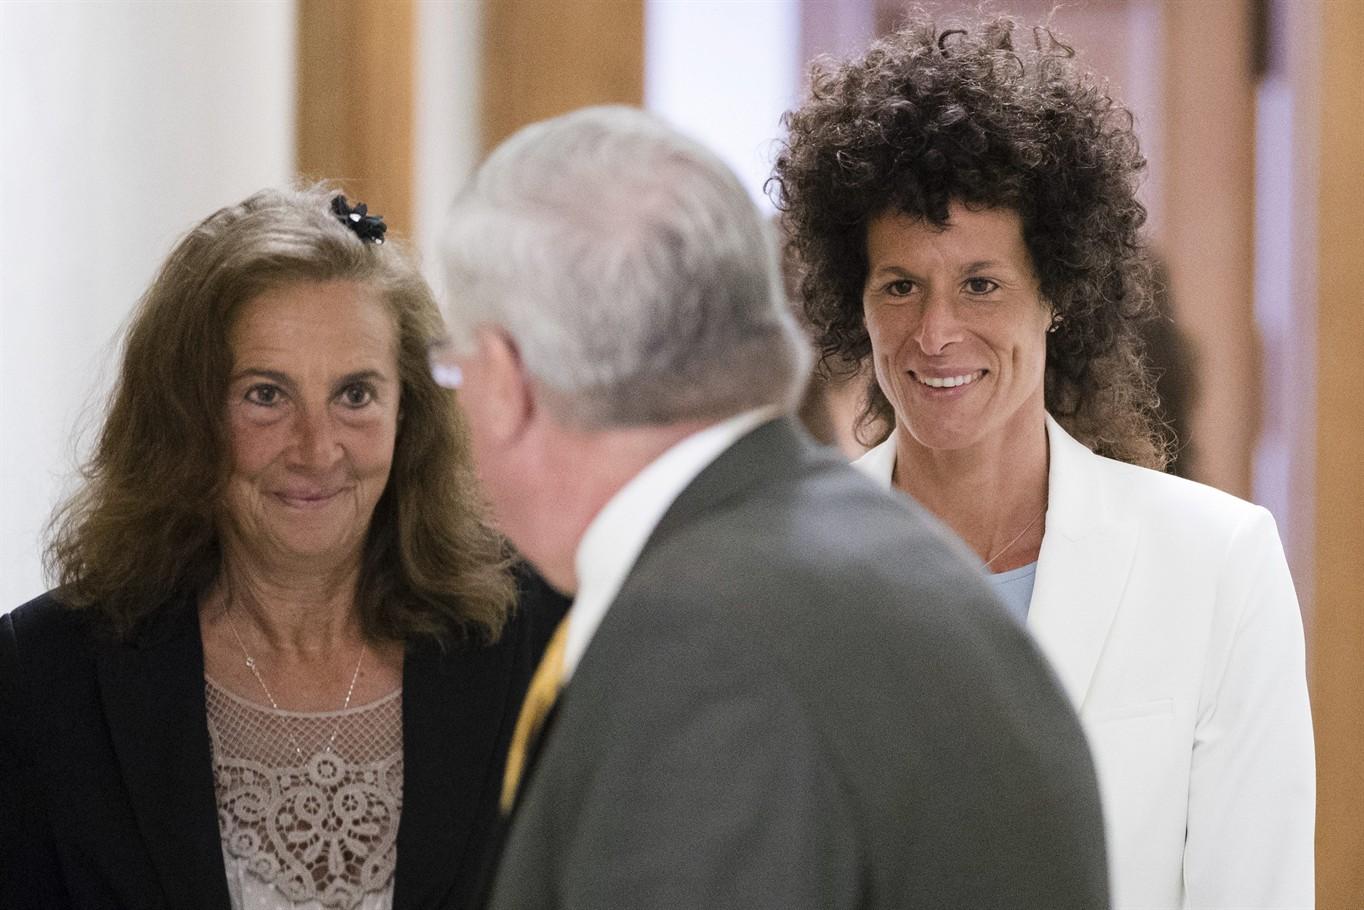 Jury in Bill Cosby sex assault case adjourns without verdict